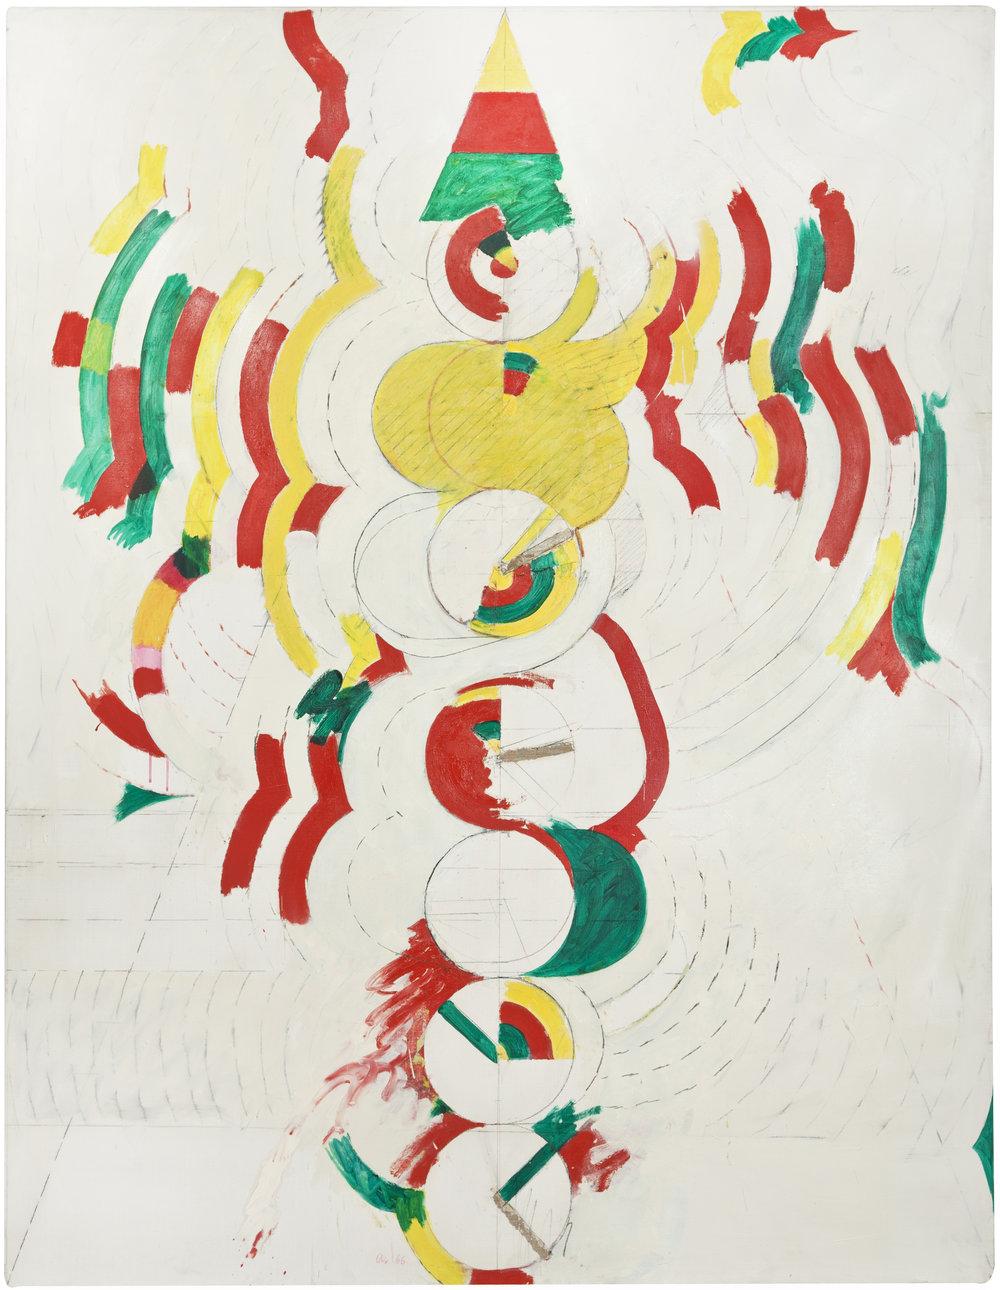 Rodolfo Aricò_Seriale_Olio su tela_1965_ 202 x 150 cm.jpg